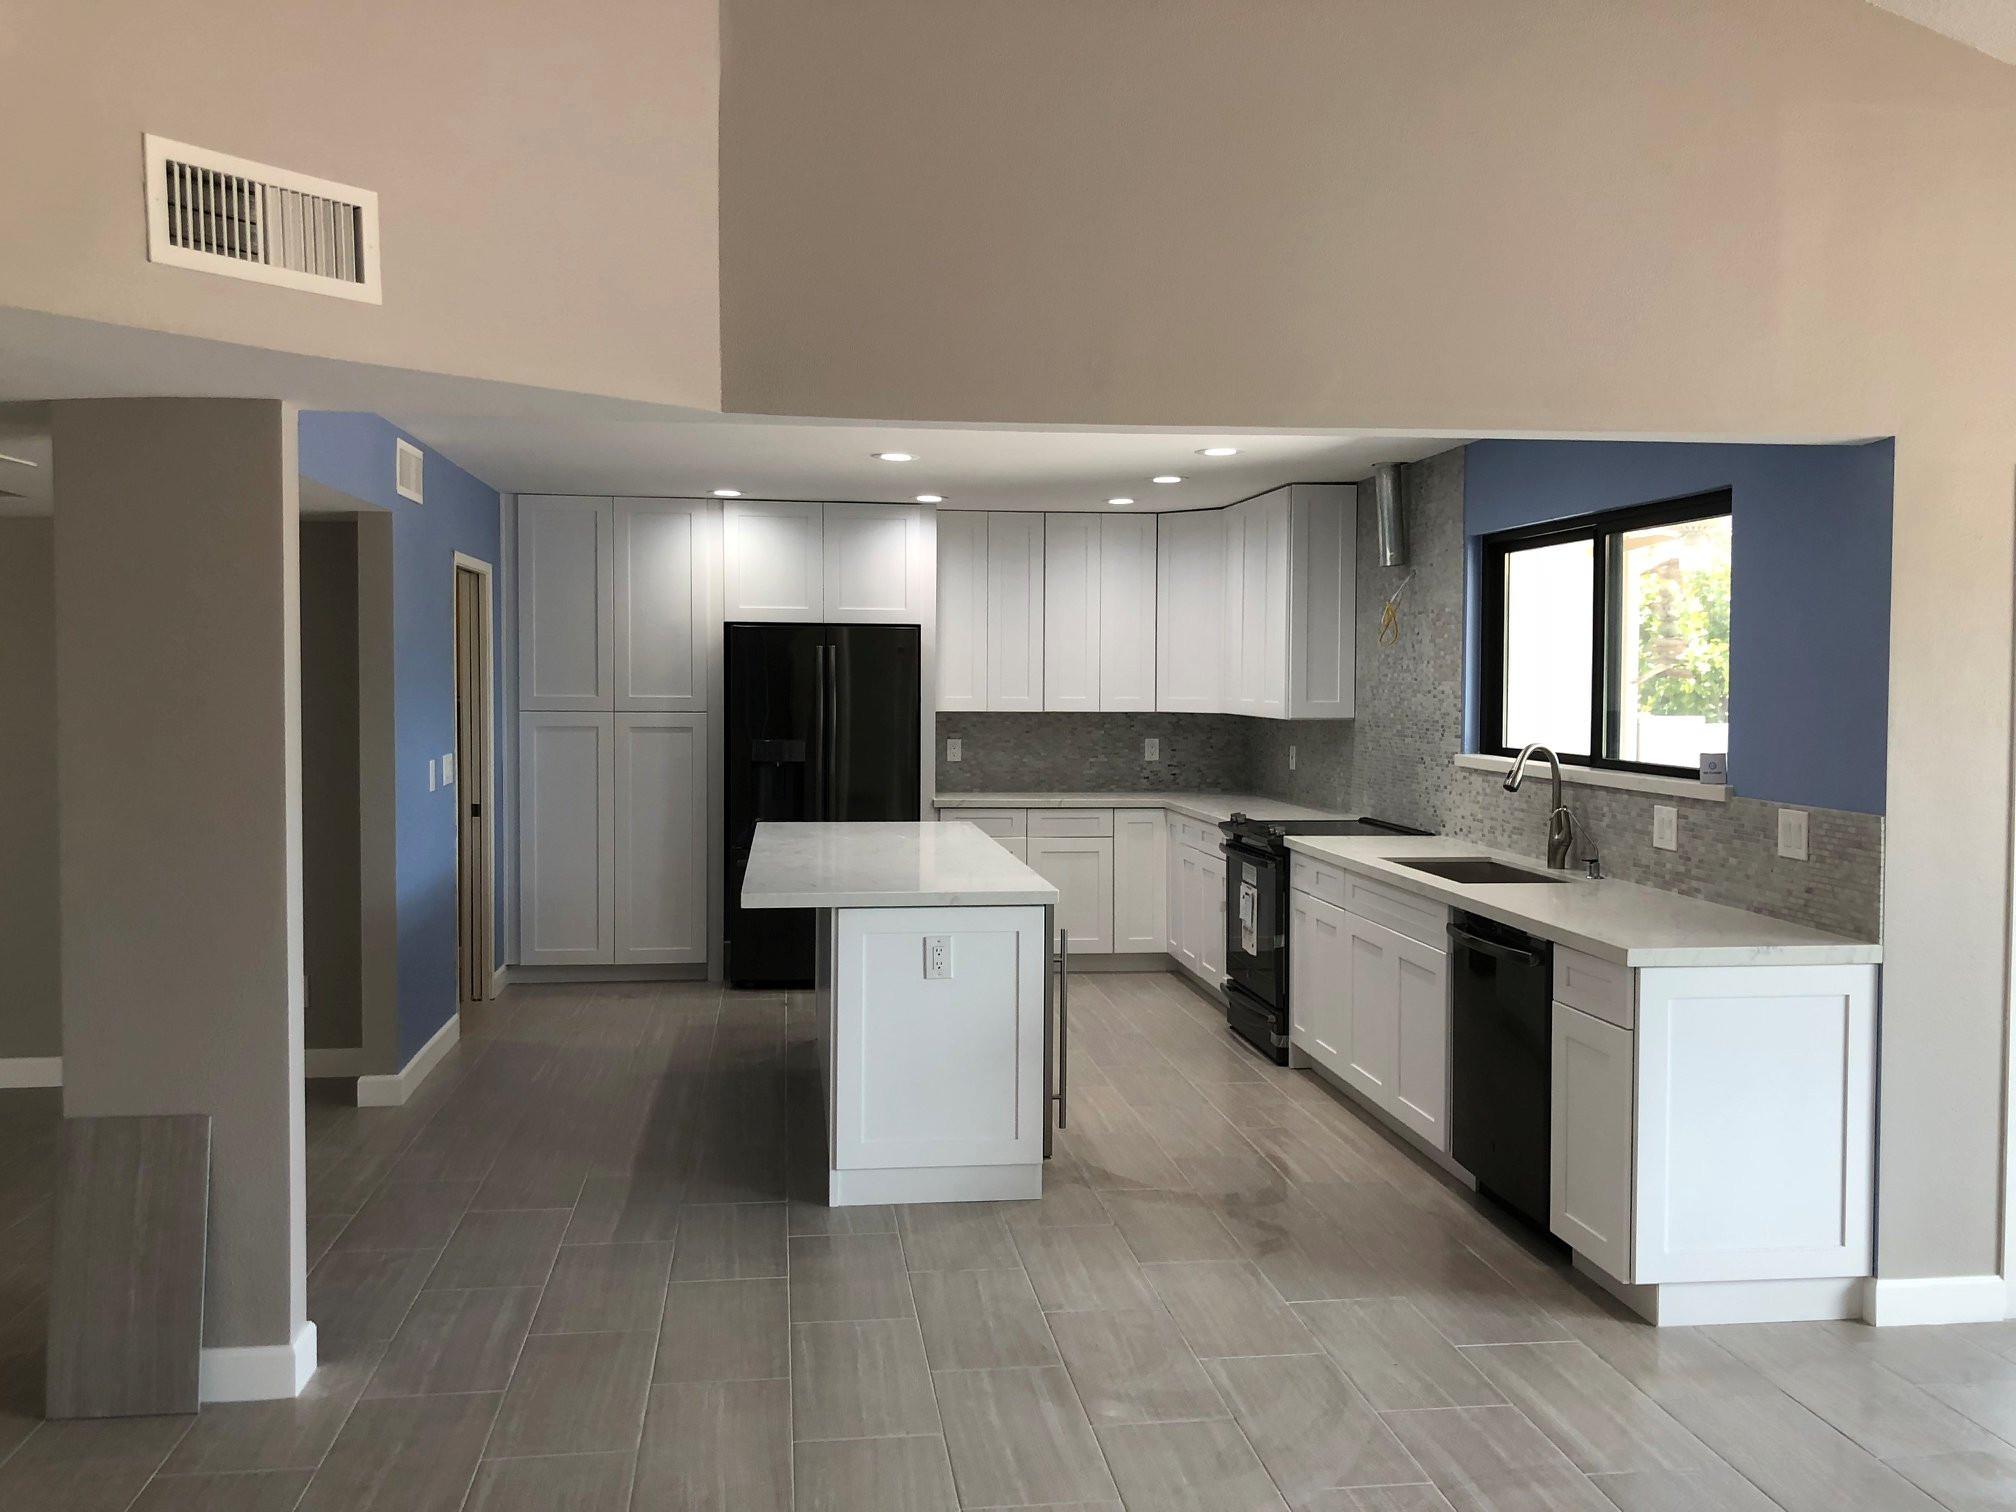 Custom Kitchen Remodel, Arizona Building and Remodeling LLC